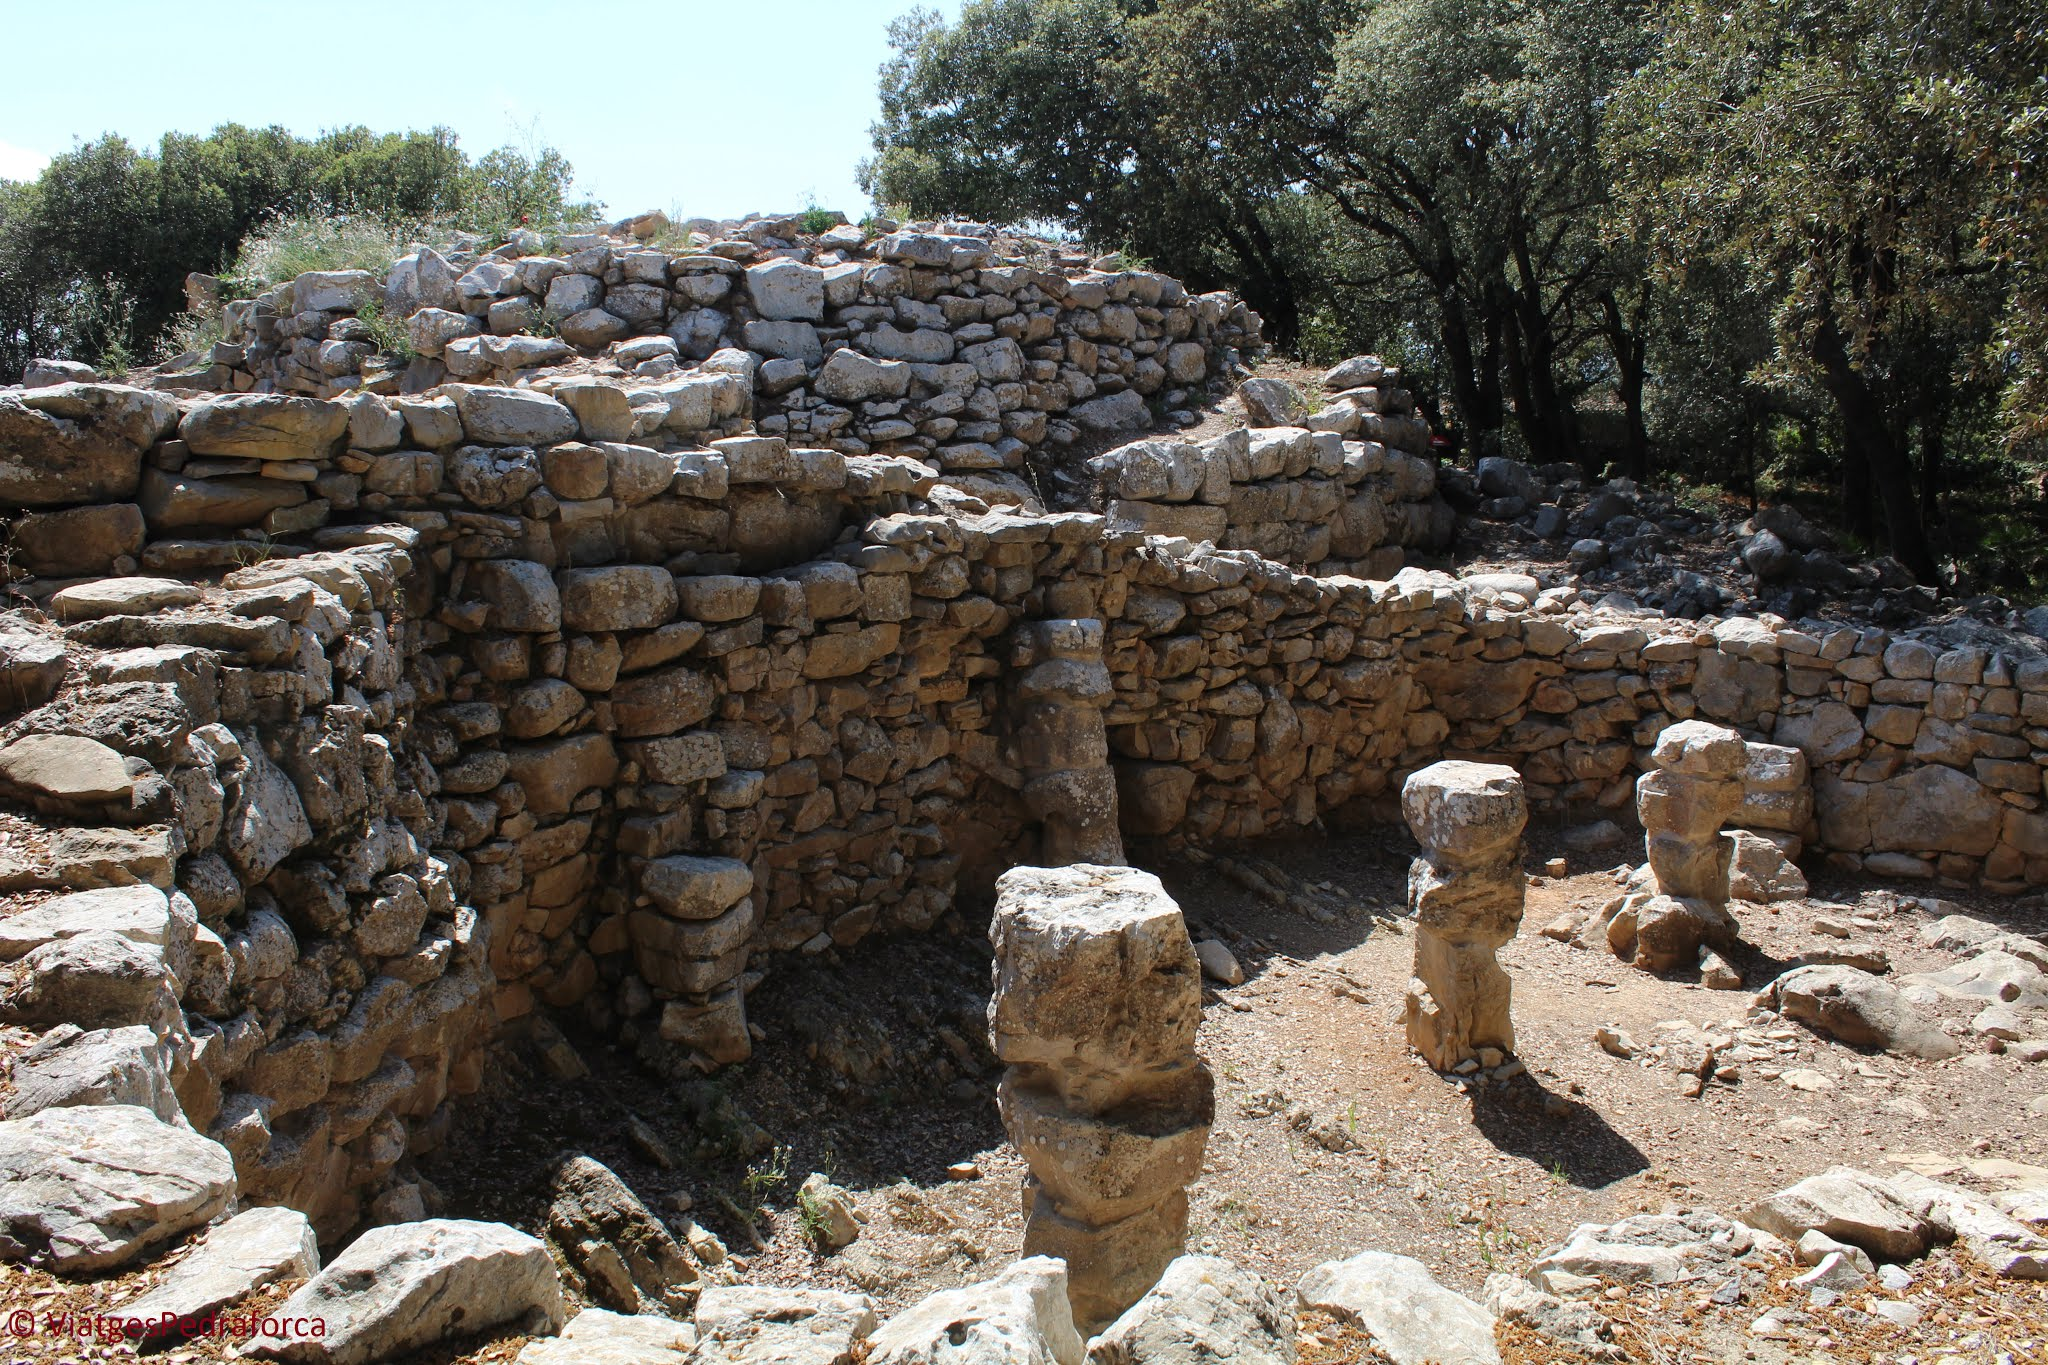 Artà, arqueologia, talaiots, Mallorca, Illes Balears, Països Catalans, patrimoni cultural